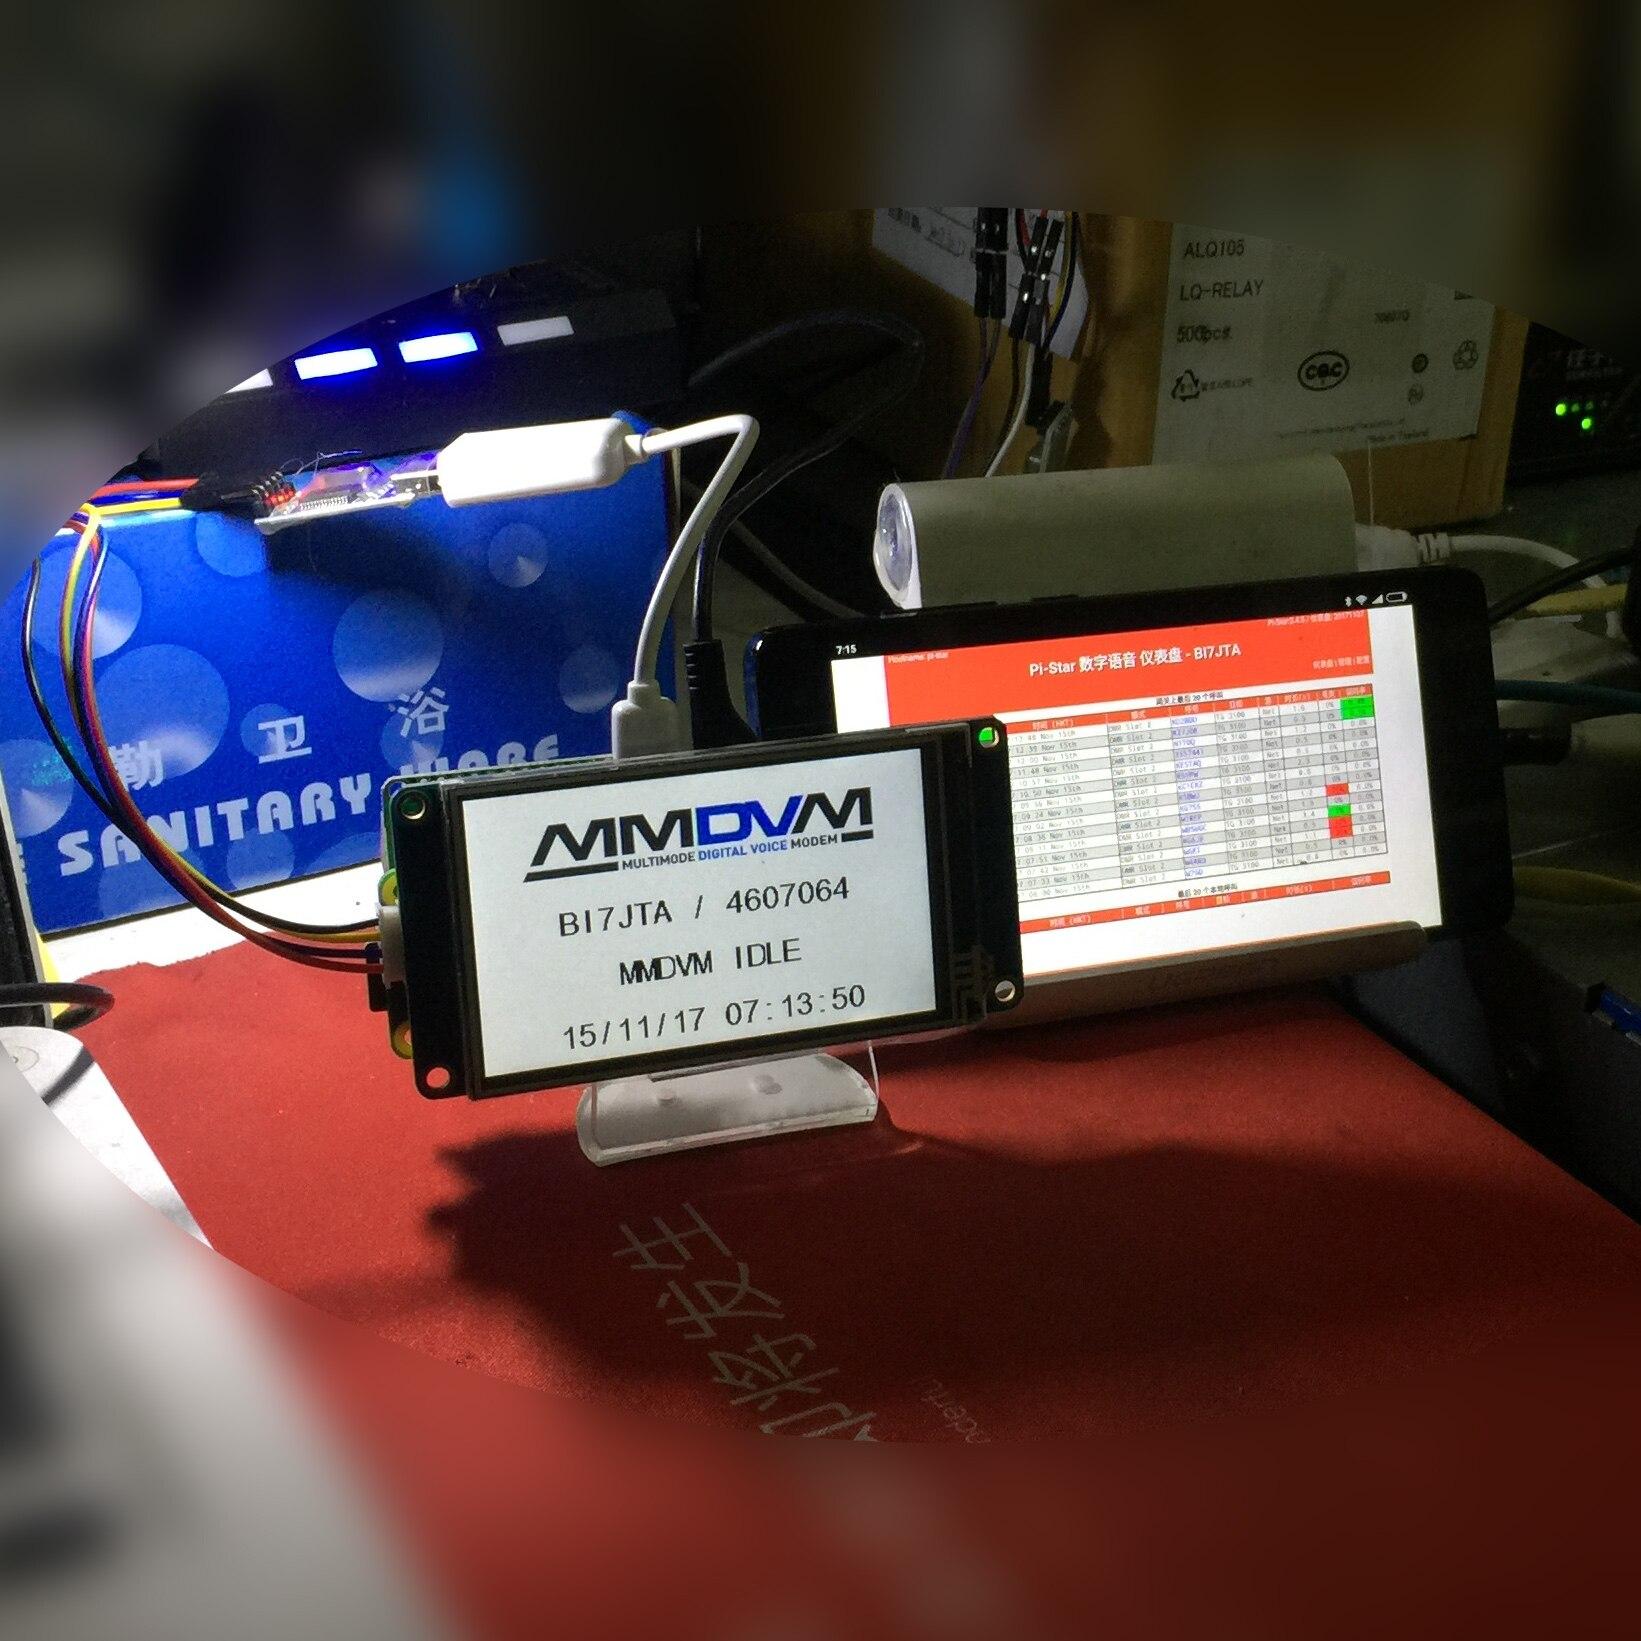 3,2 дюймов Экран Nano mmdvm Hotspot nanopi NEO HAM DIY Kit Поддержка P25  DMR